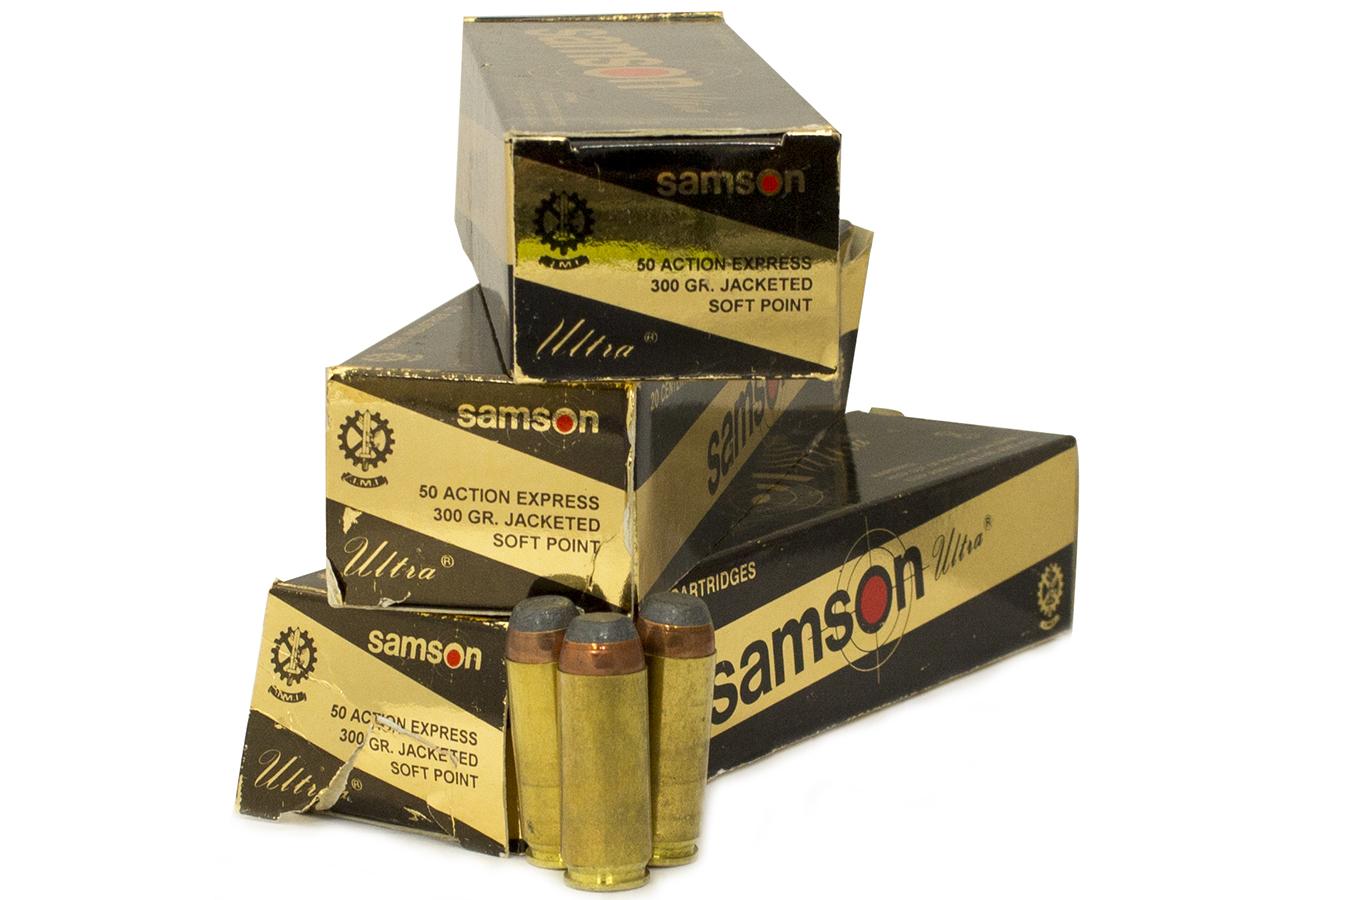 Lot of Samson Ultra 50 AE Ammunition (60 Rounds)